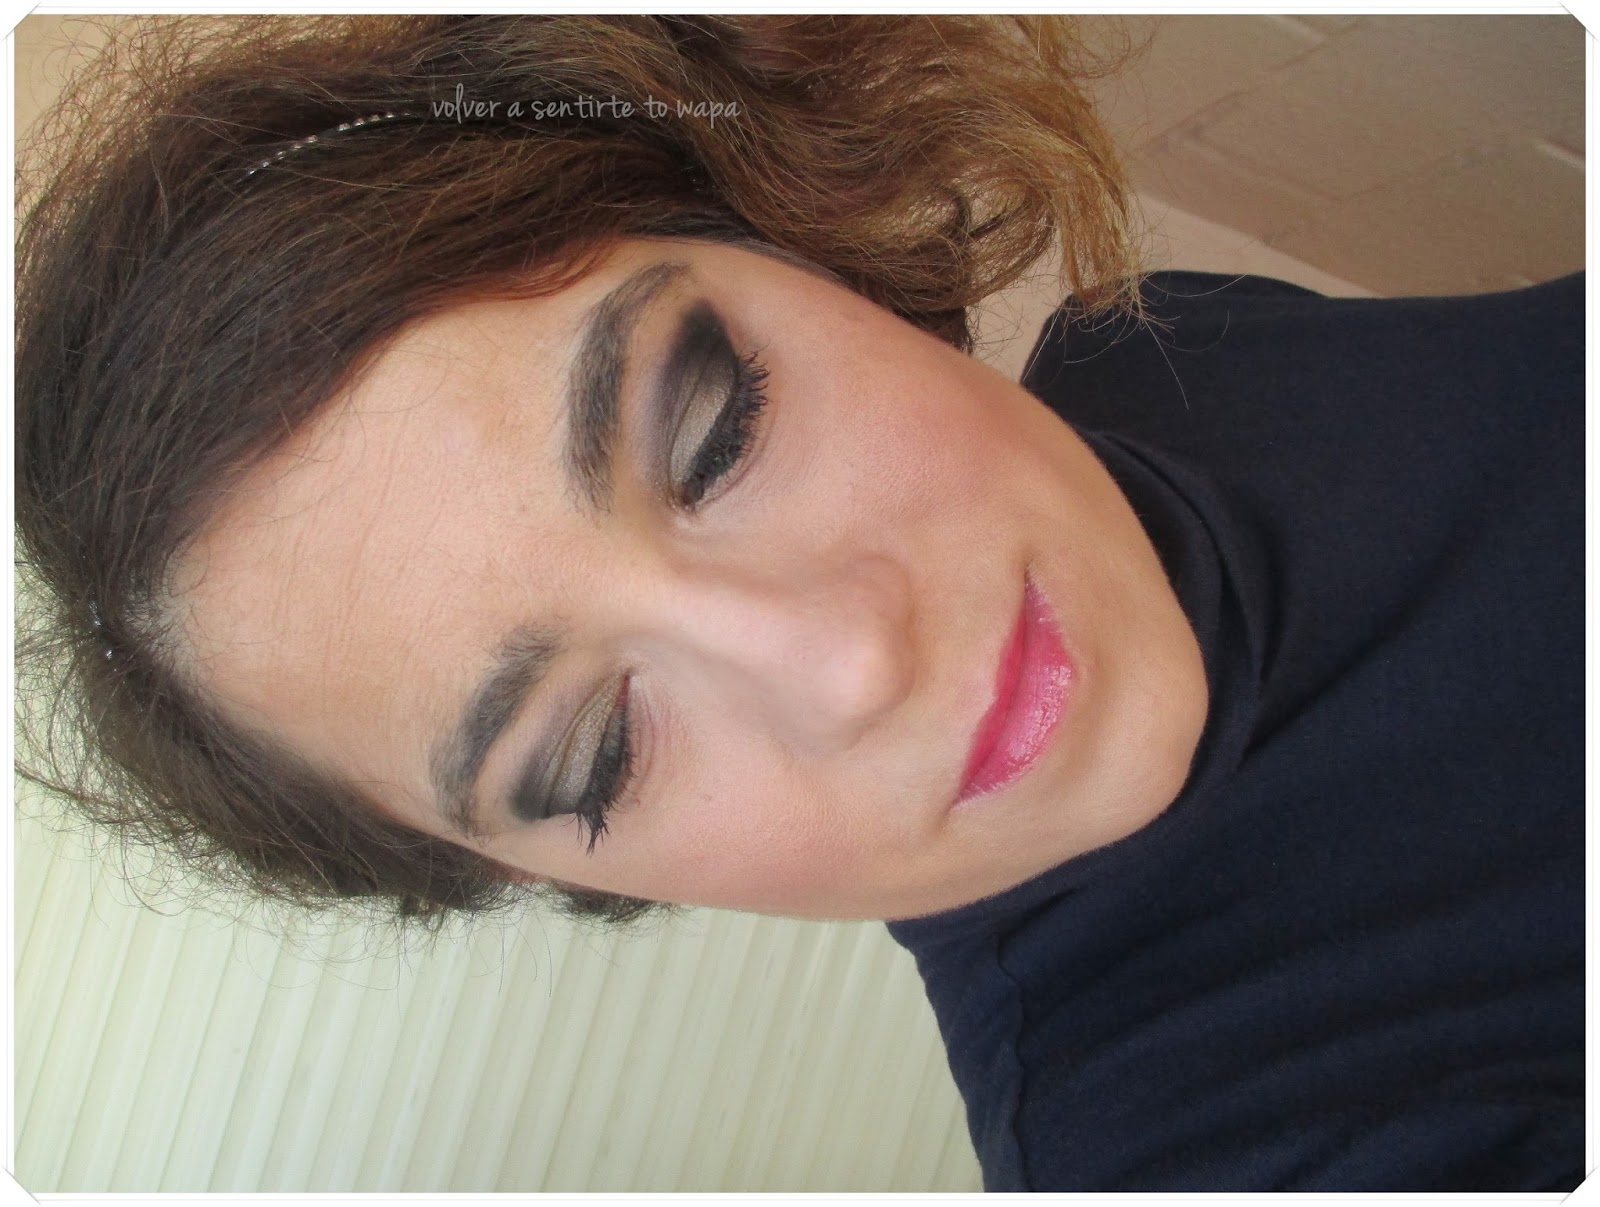 Maquillaje para Fiestas: Dorado Oliva & Negro